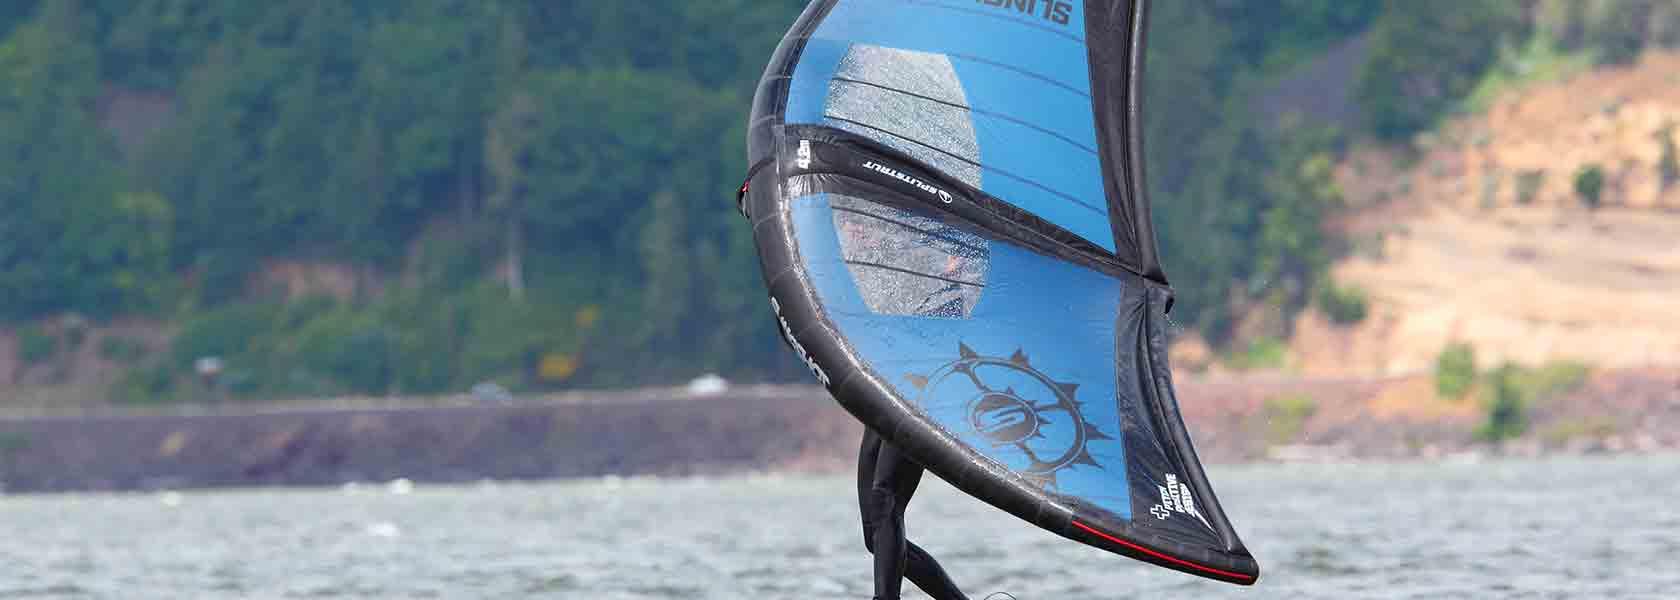 Windsurfing Archives - Slingshot Sports